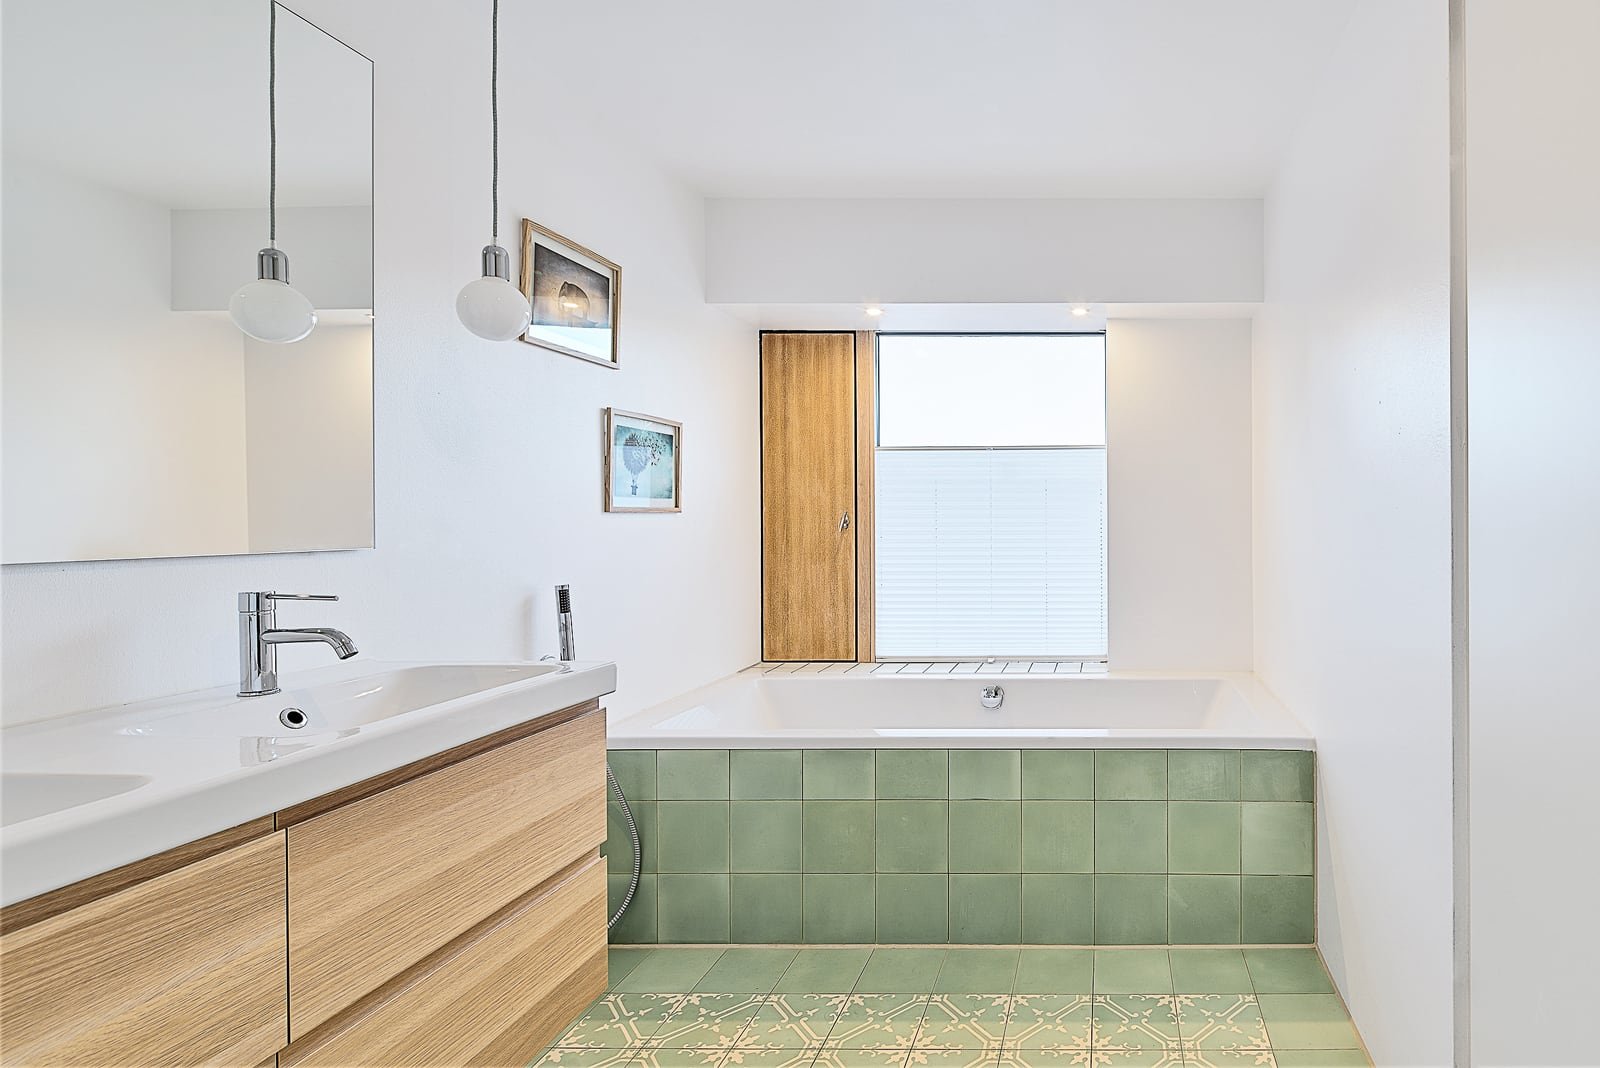 zementfliesen-terrazzofliesen-kreidefarbe-terrazzo-fugenlos-viaplatten-50-badewanne | 50